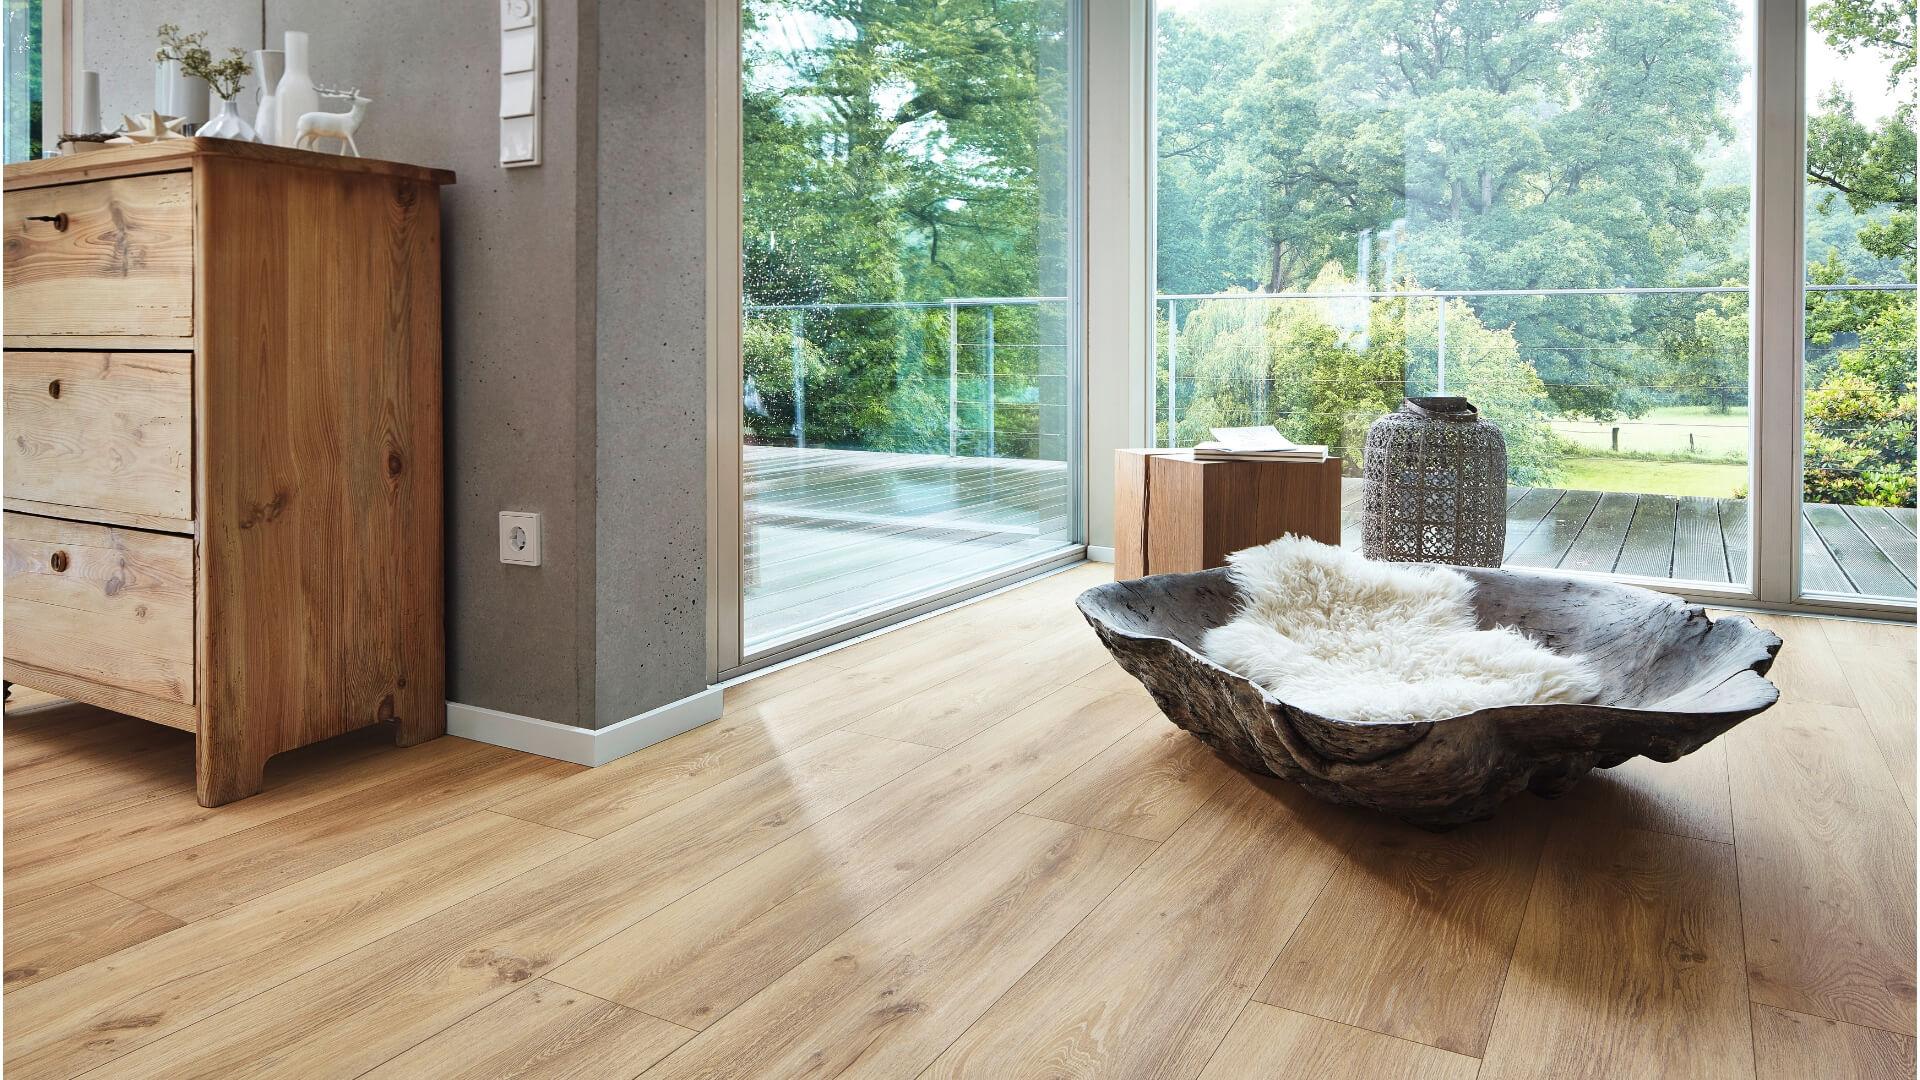 Kehrs Katalog Bild Bad Interior mit Holzboden